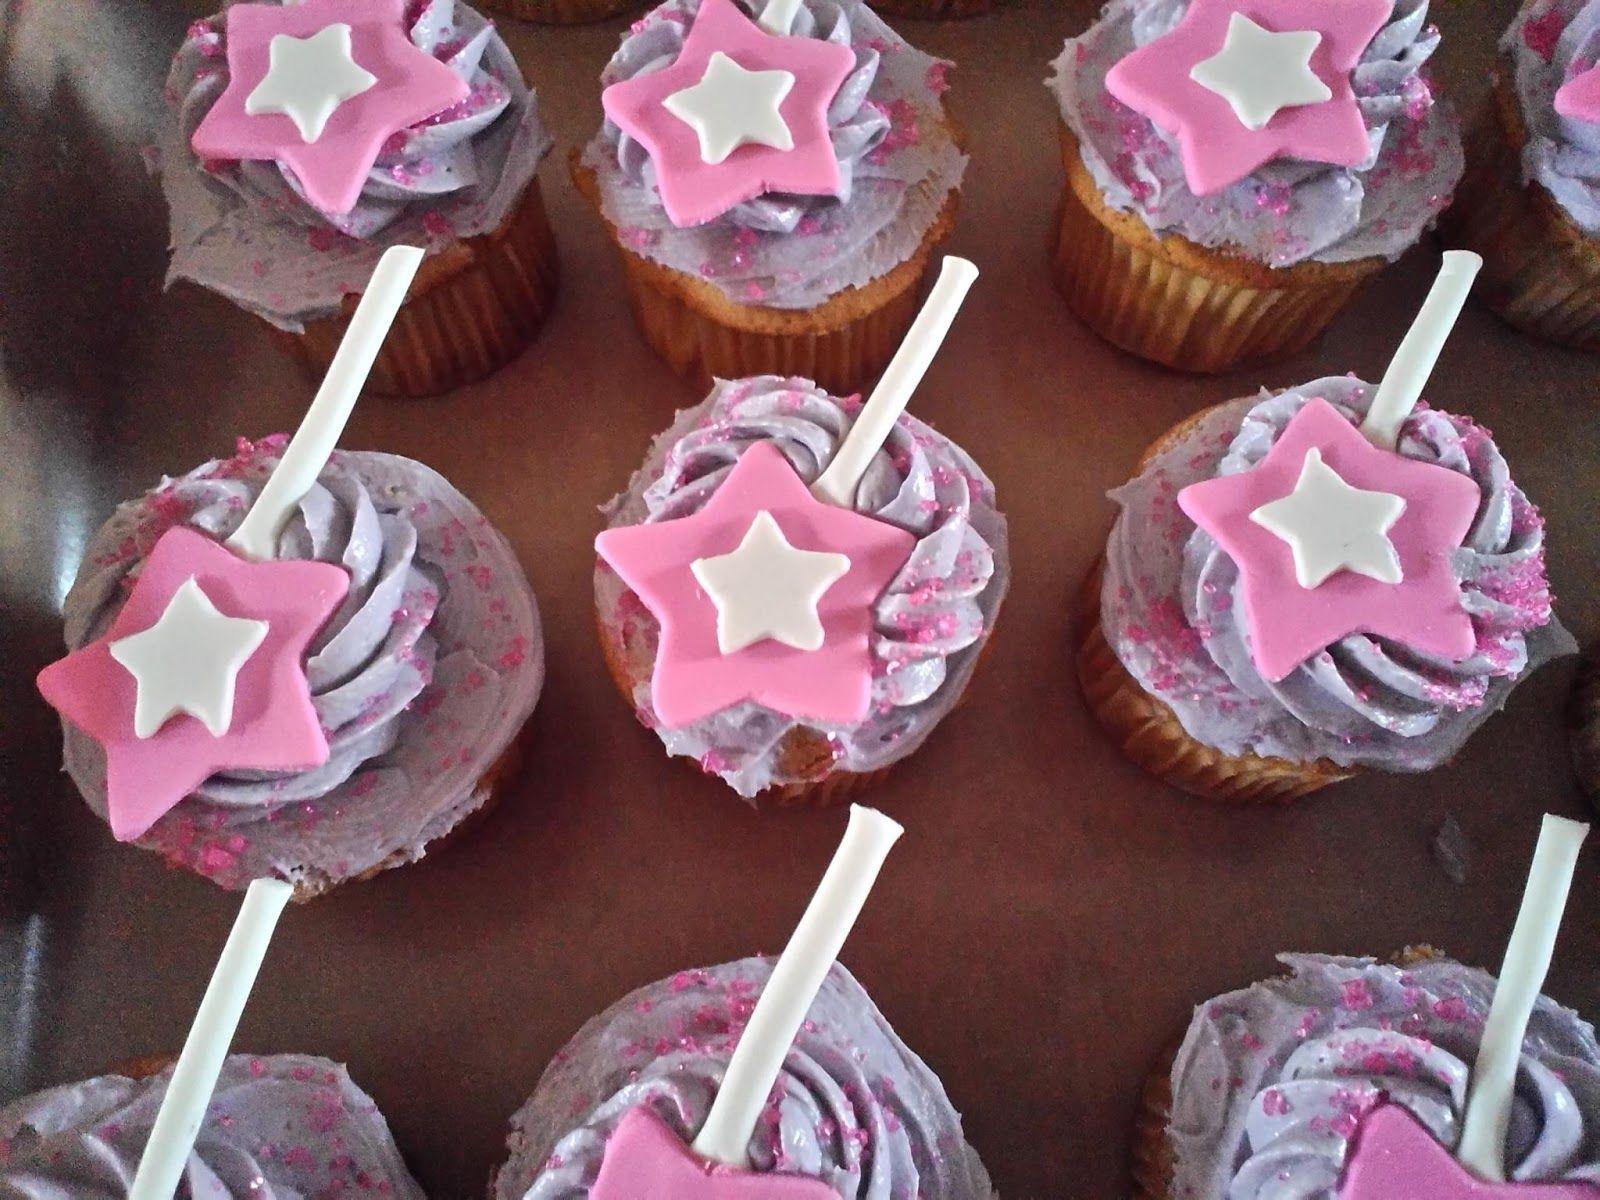 sugar toppers: Varitas mágicas